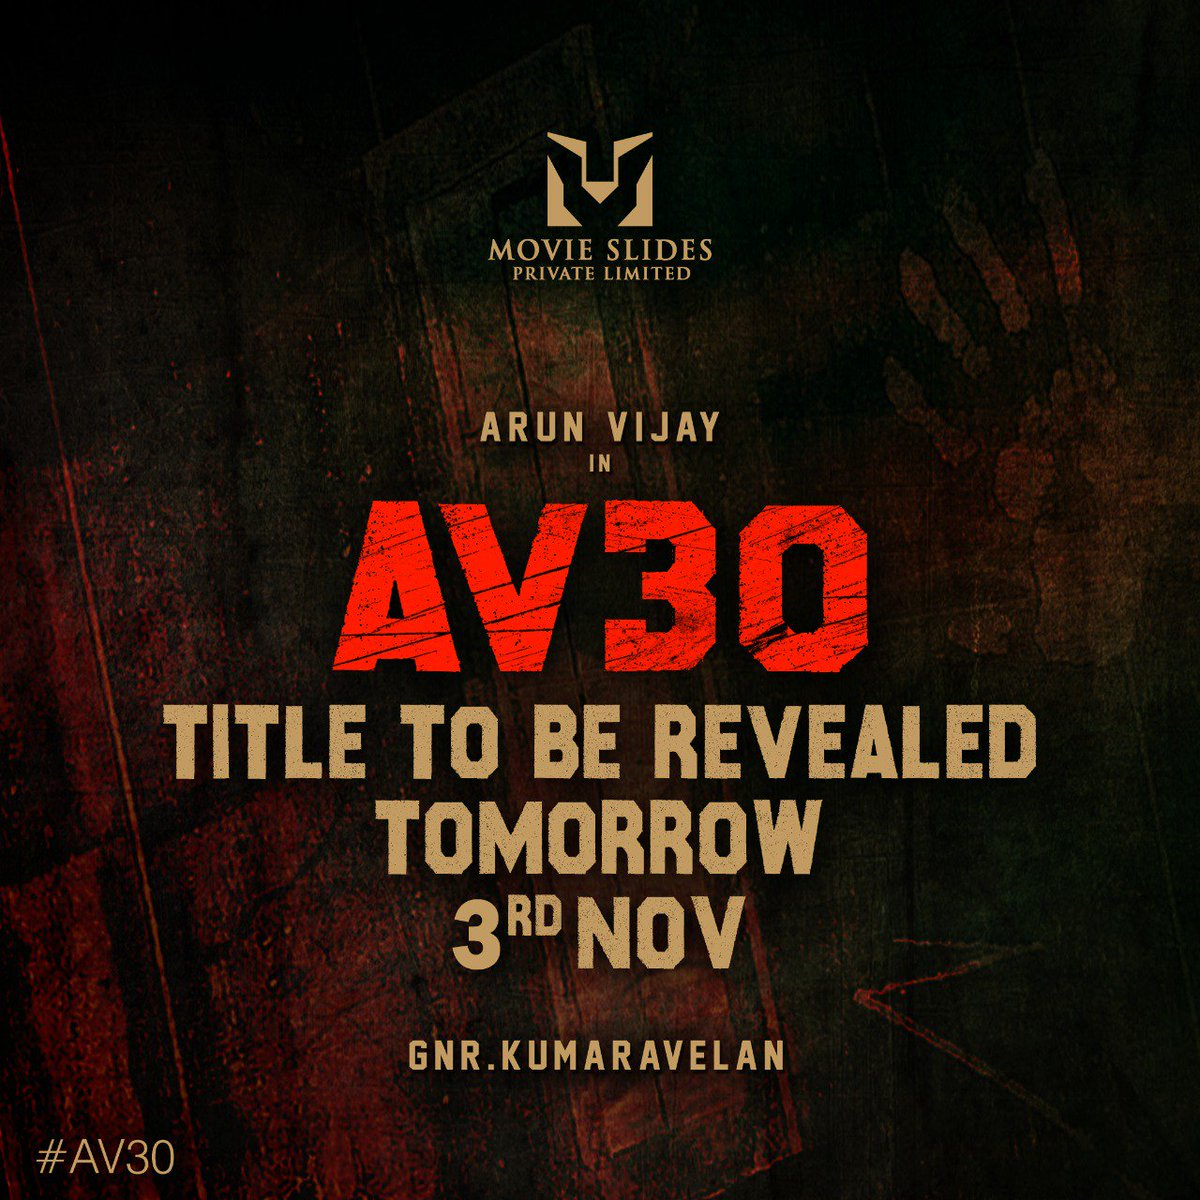 #AV30Title will be announced tomorrow November 3rd.  @arunvijayno1 | Directed by #GNRKumaravelan | @DoneChannel1